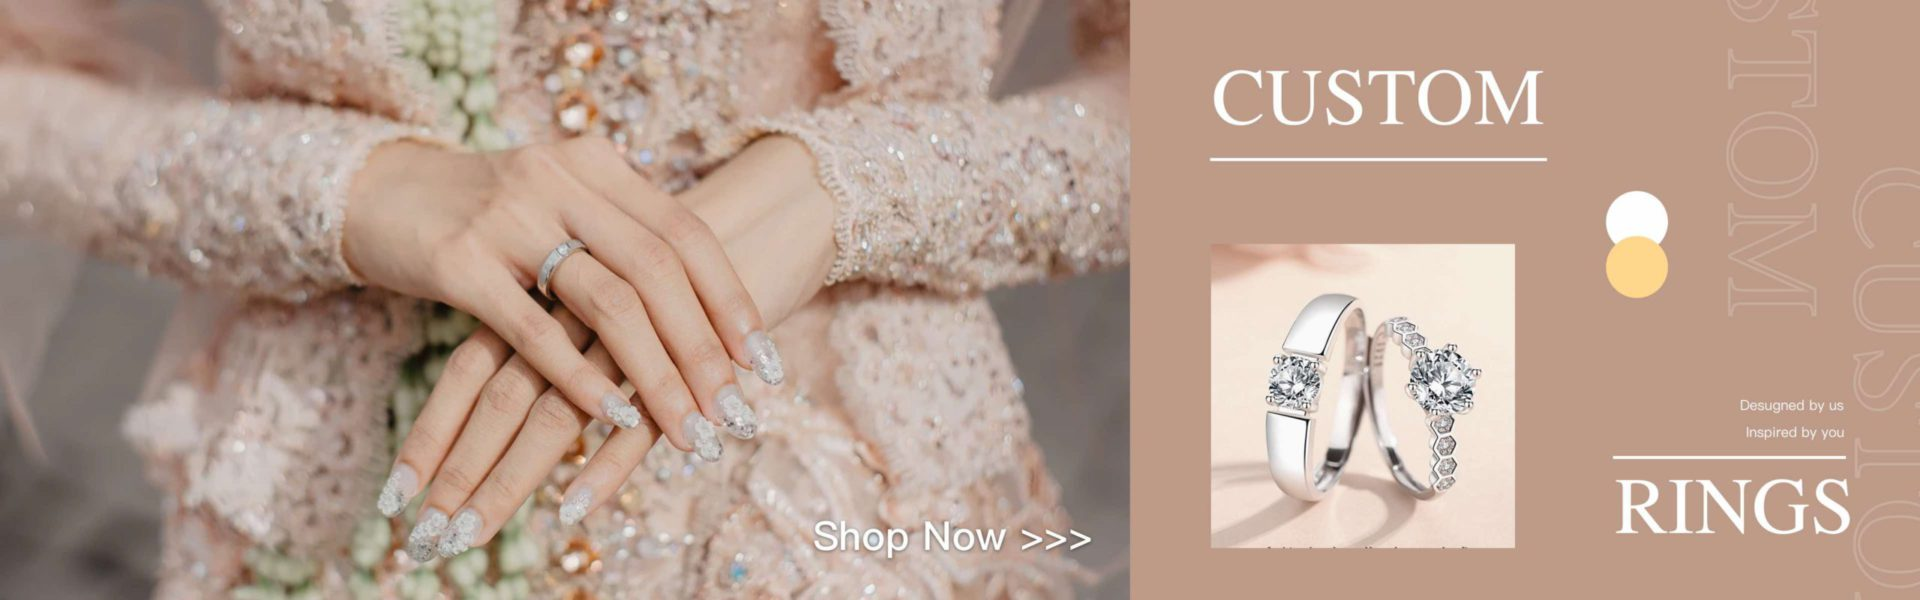 KoalaPrint custom cpuple rings-Shop Now